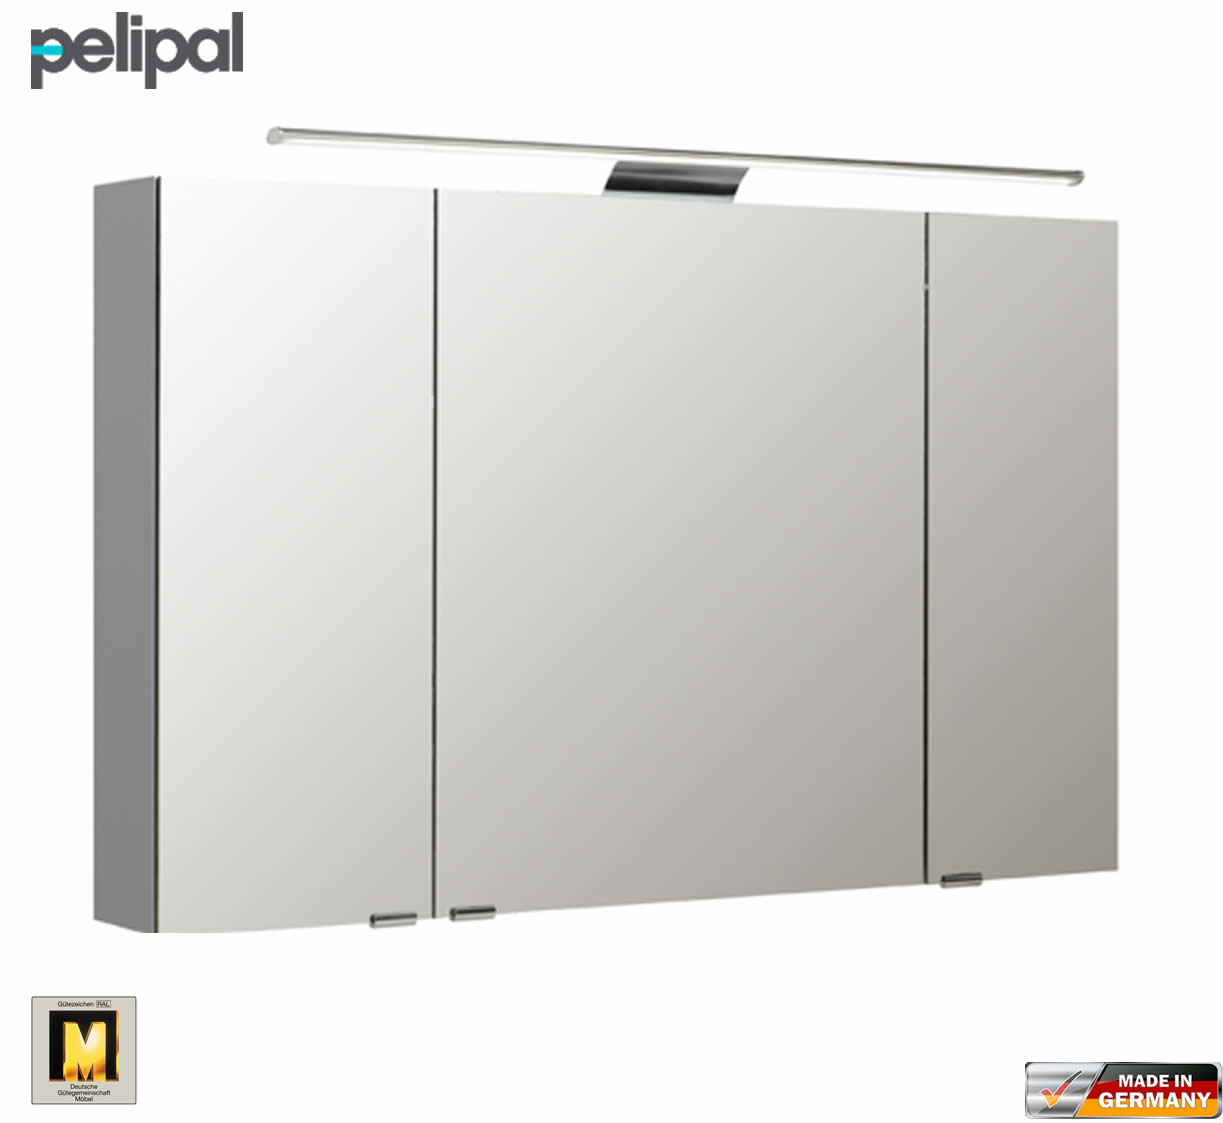 pelipal neutraler spiegelschrank s5 110 cm mit led aufbauleuchte impulsbad. Black Bedroom Furniture Sets. Home Design Ideas